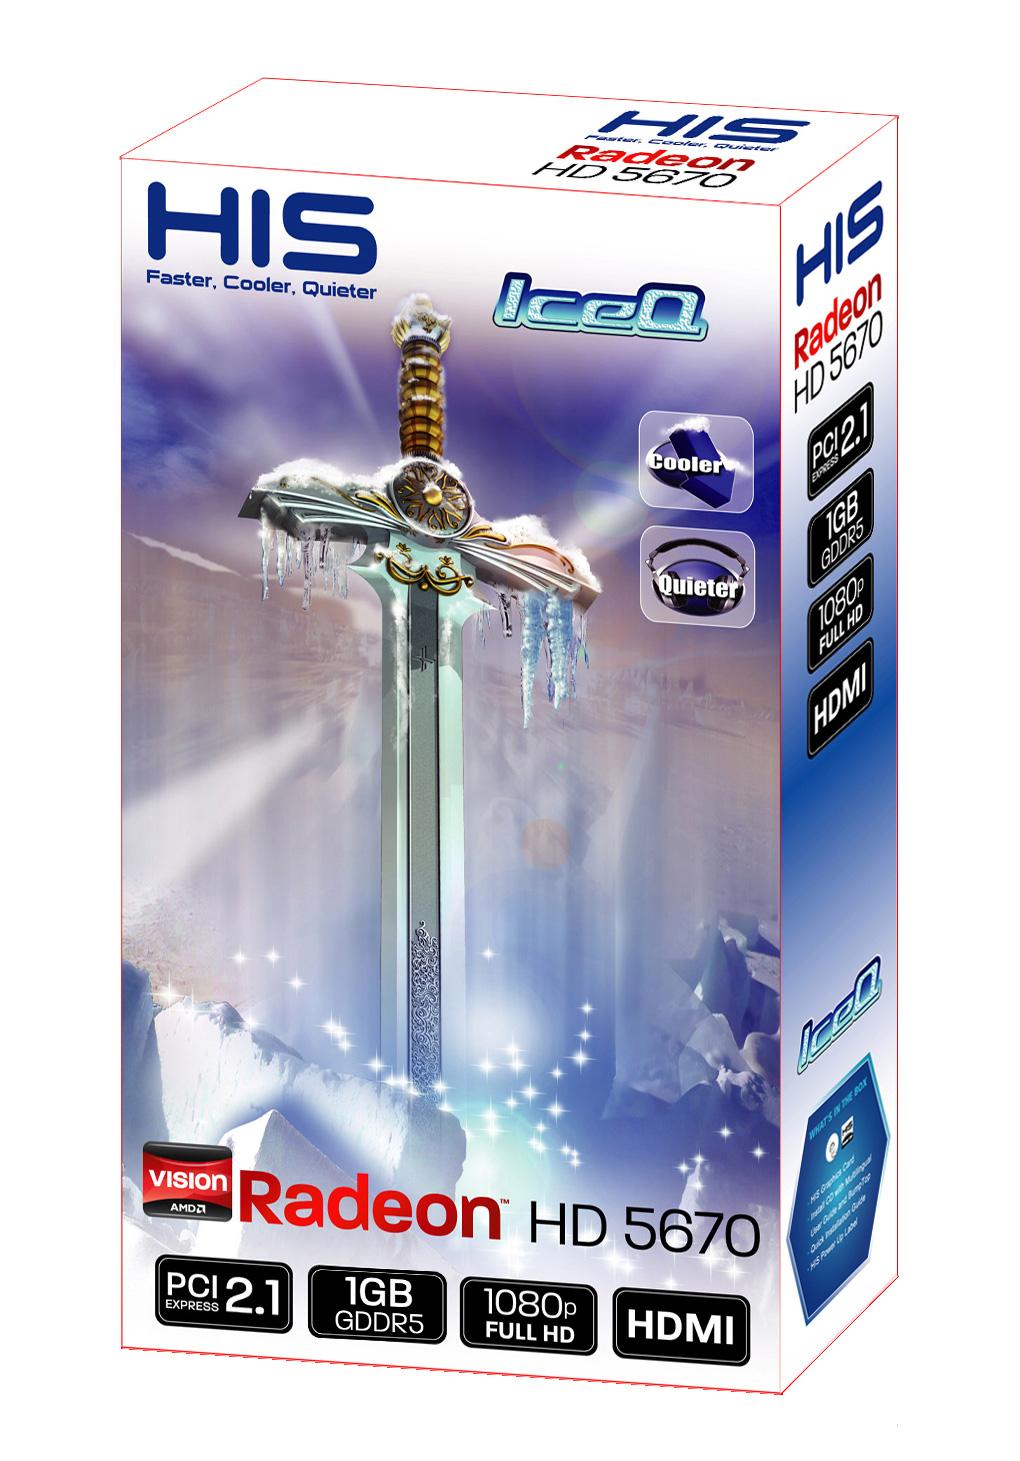 amd radeon hd 5670 driver download windows 7 64 bit